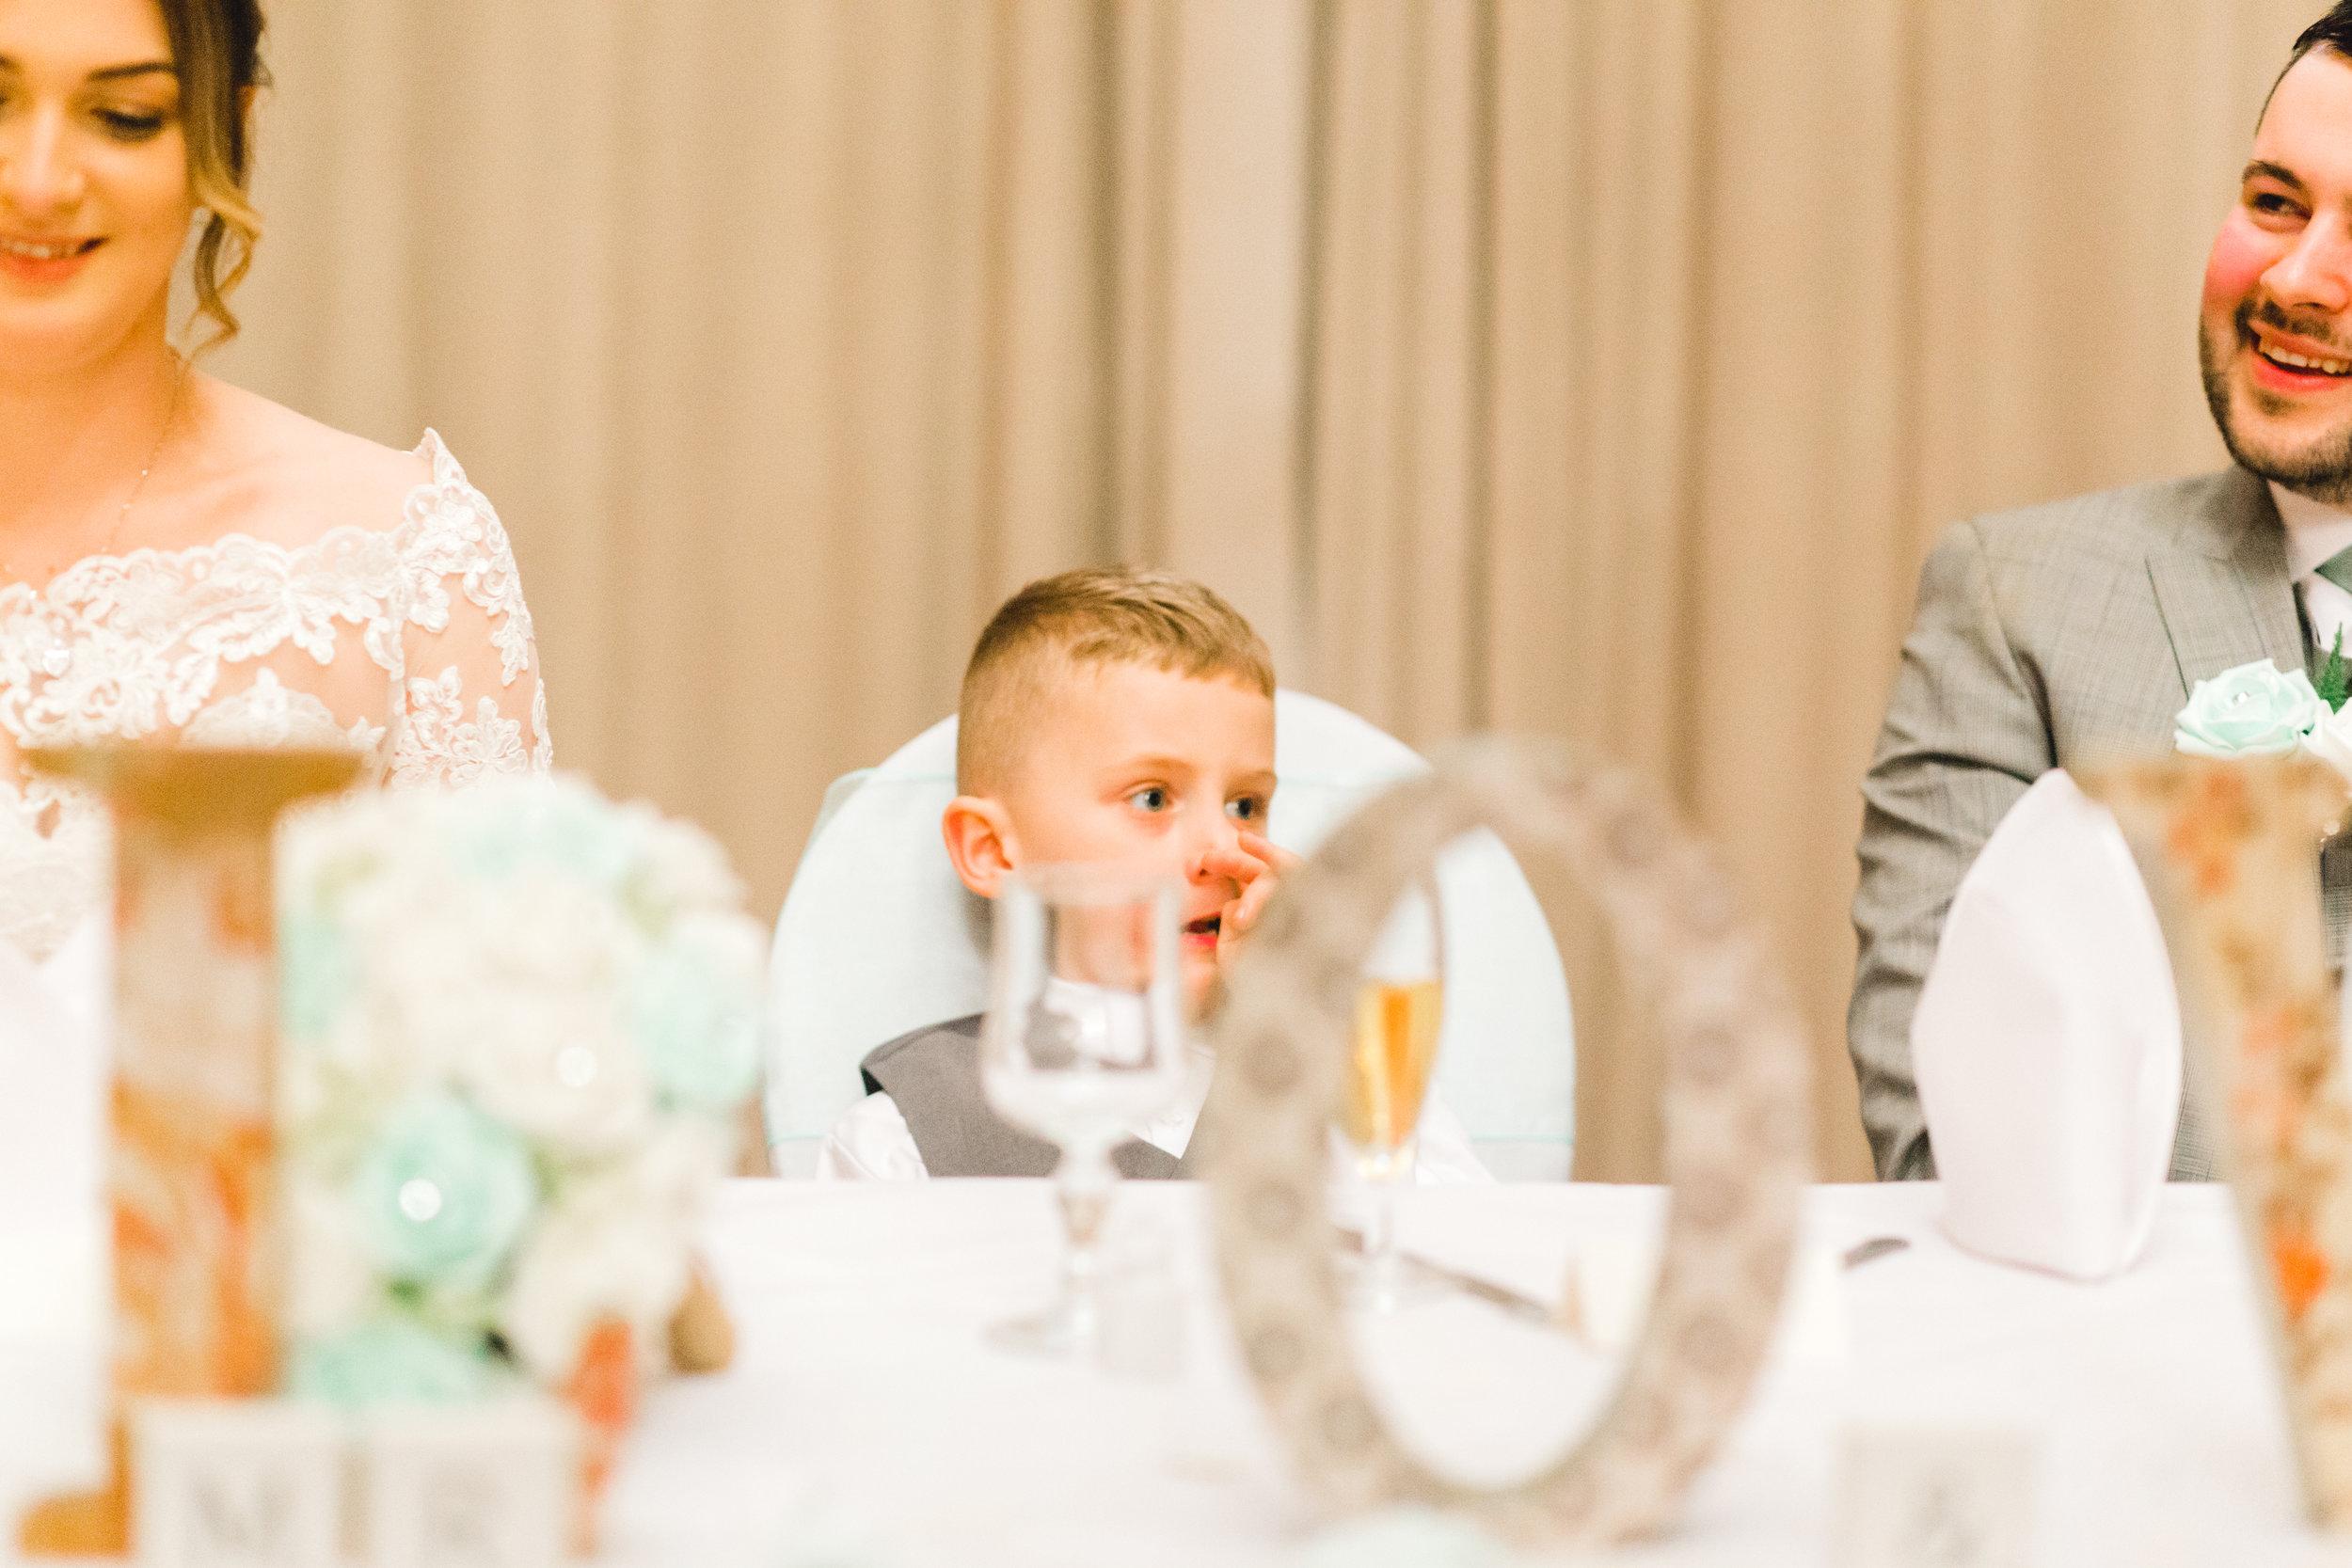 little boy picks his nose during wedding speeches